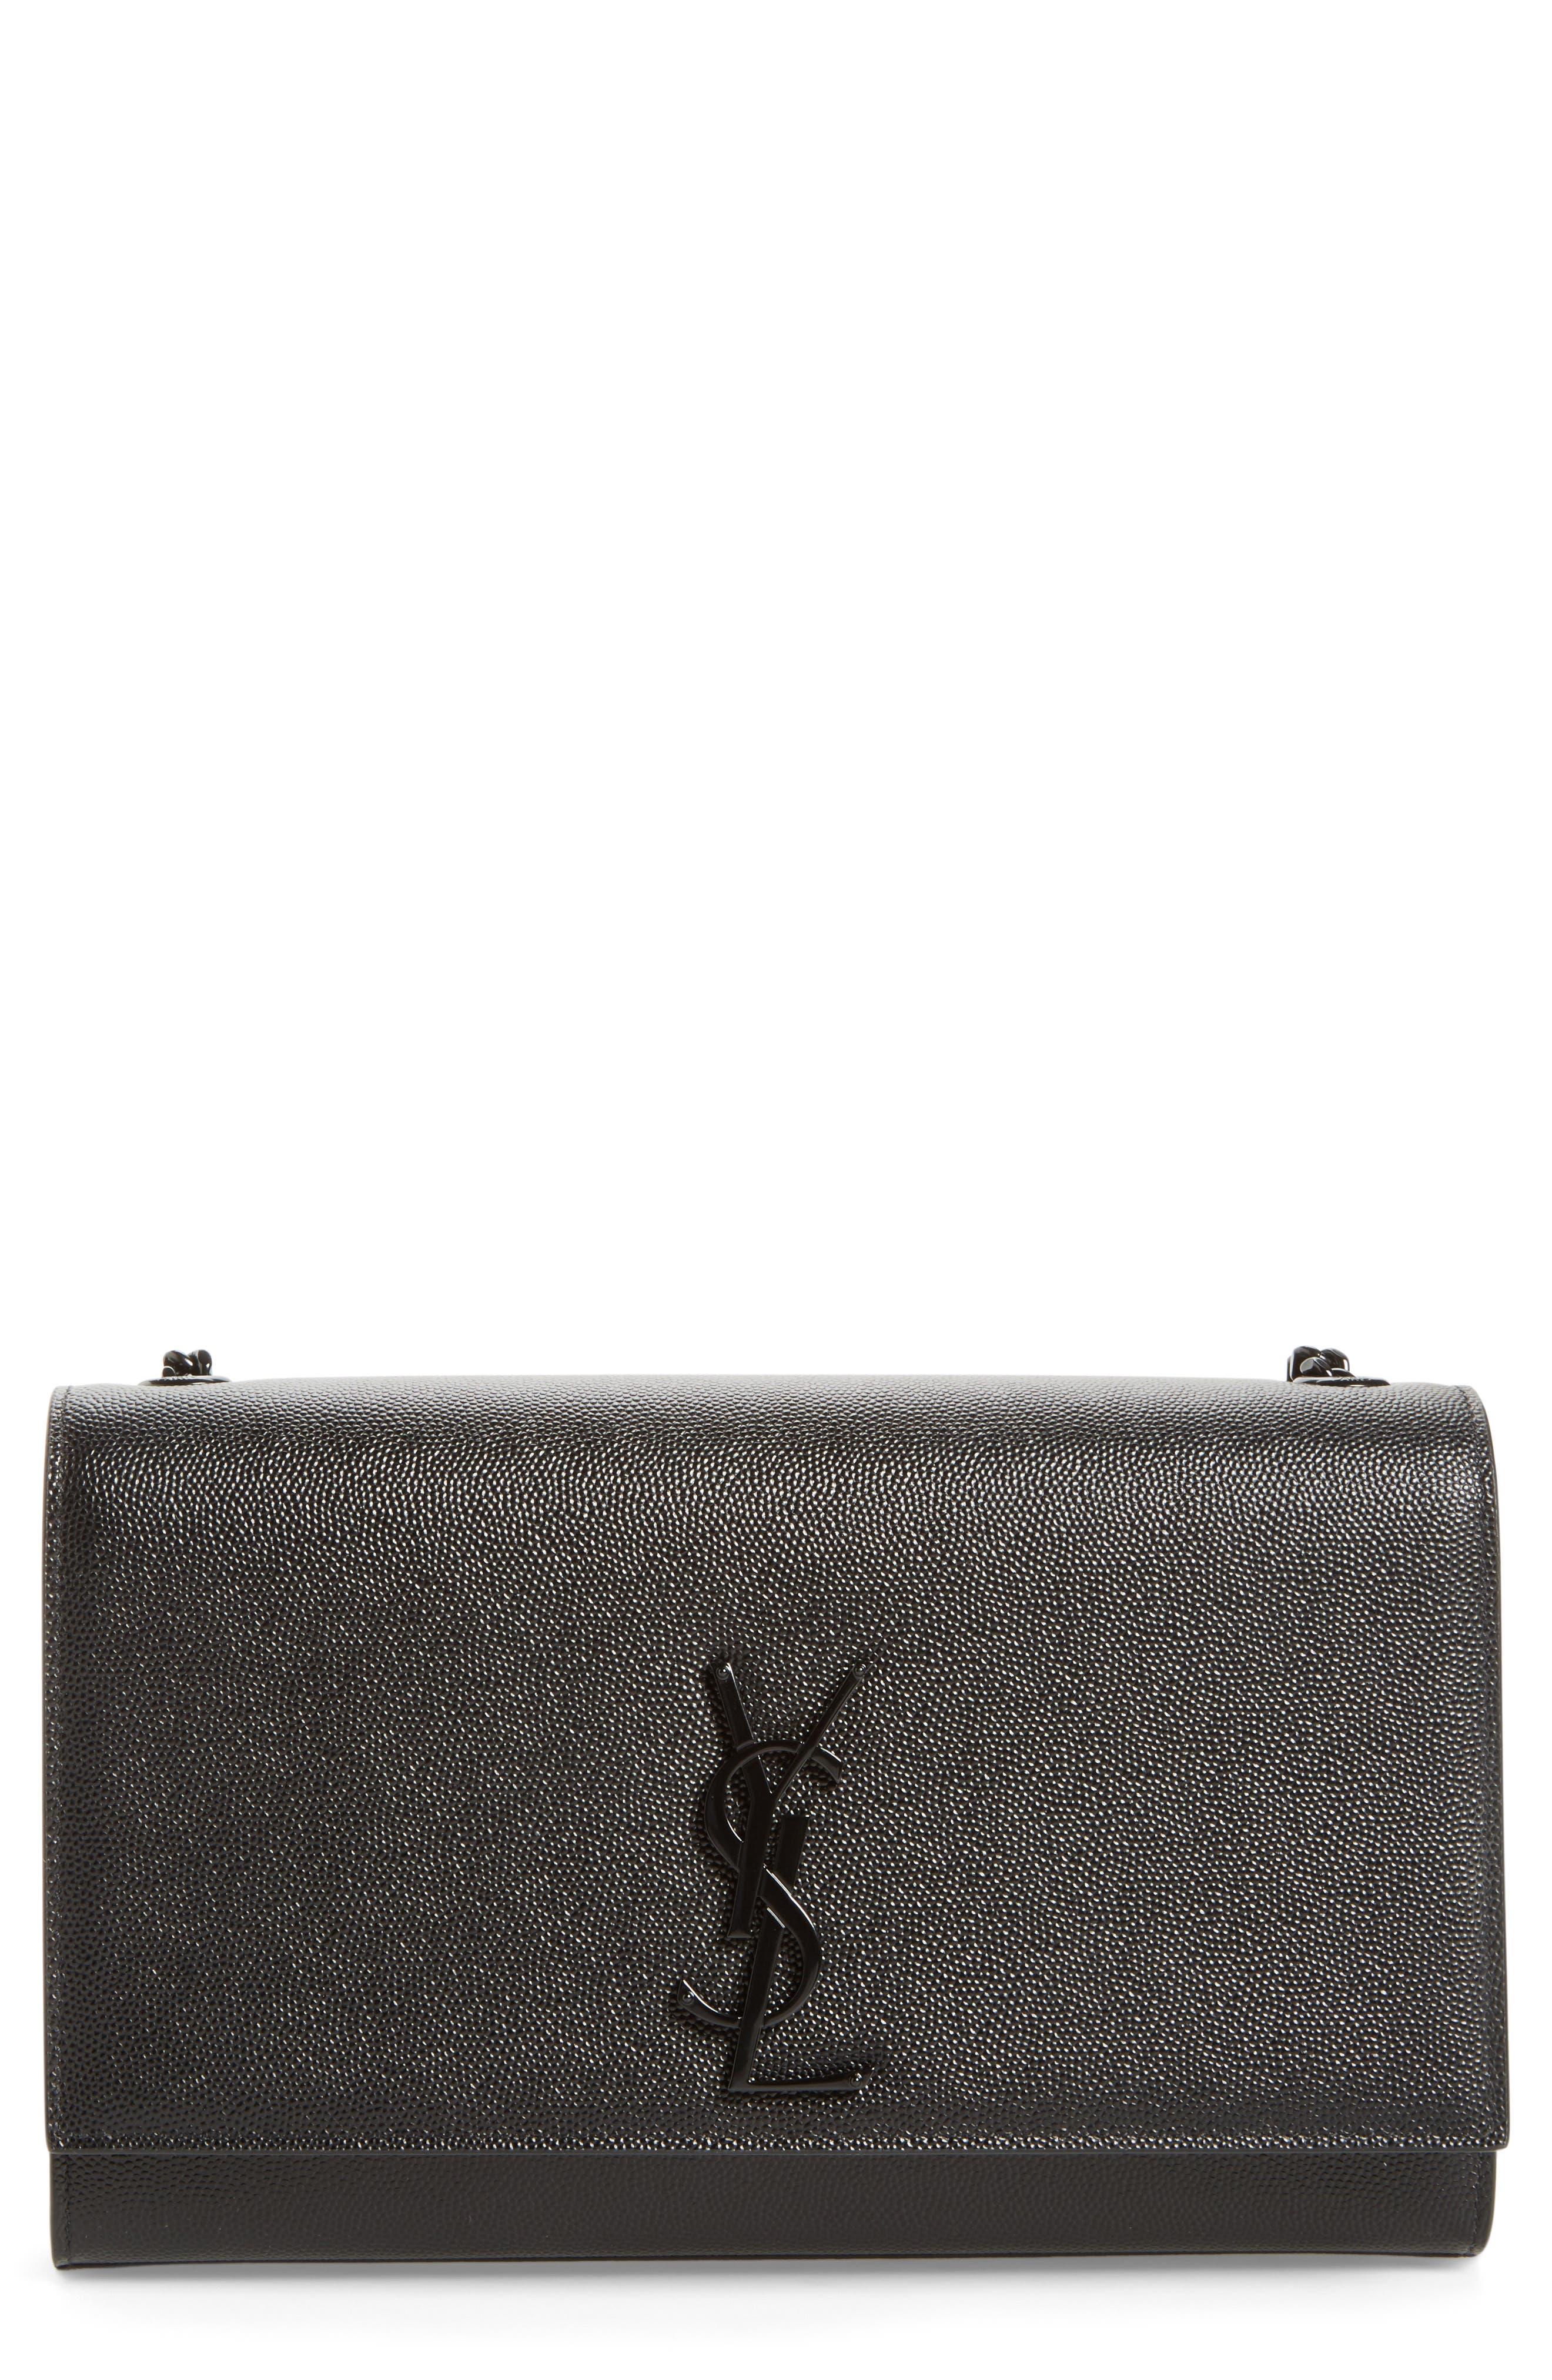 SAINT LAURENT, Medium Monogram Leather Crossbody Bag, Main thumbnail 1, color, NERO